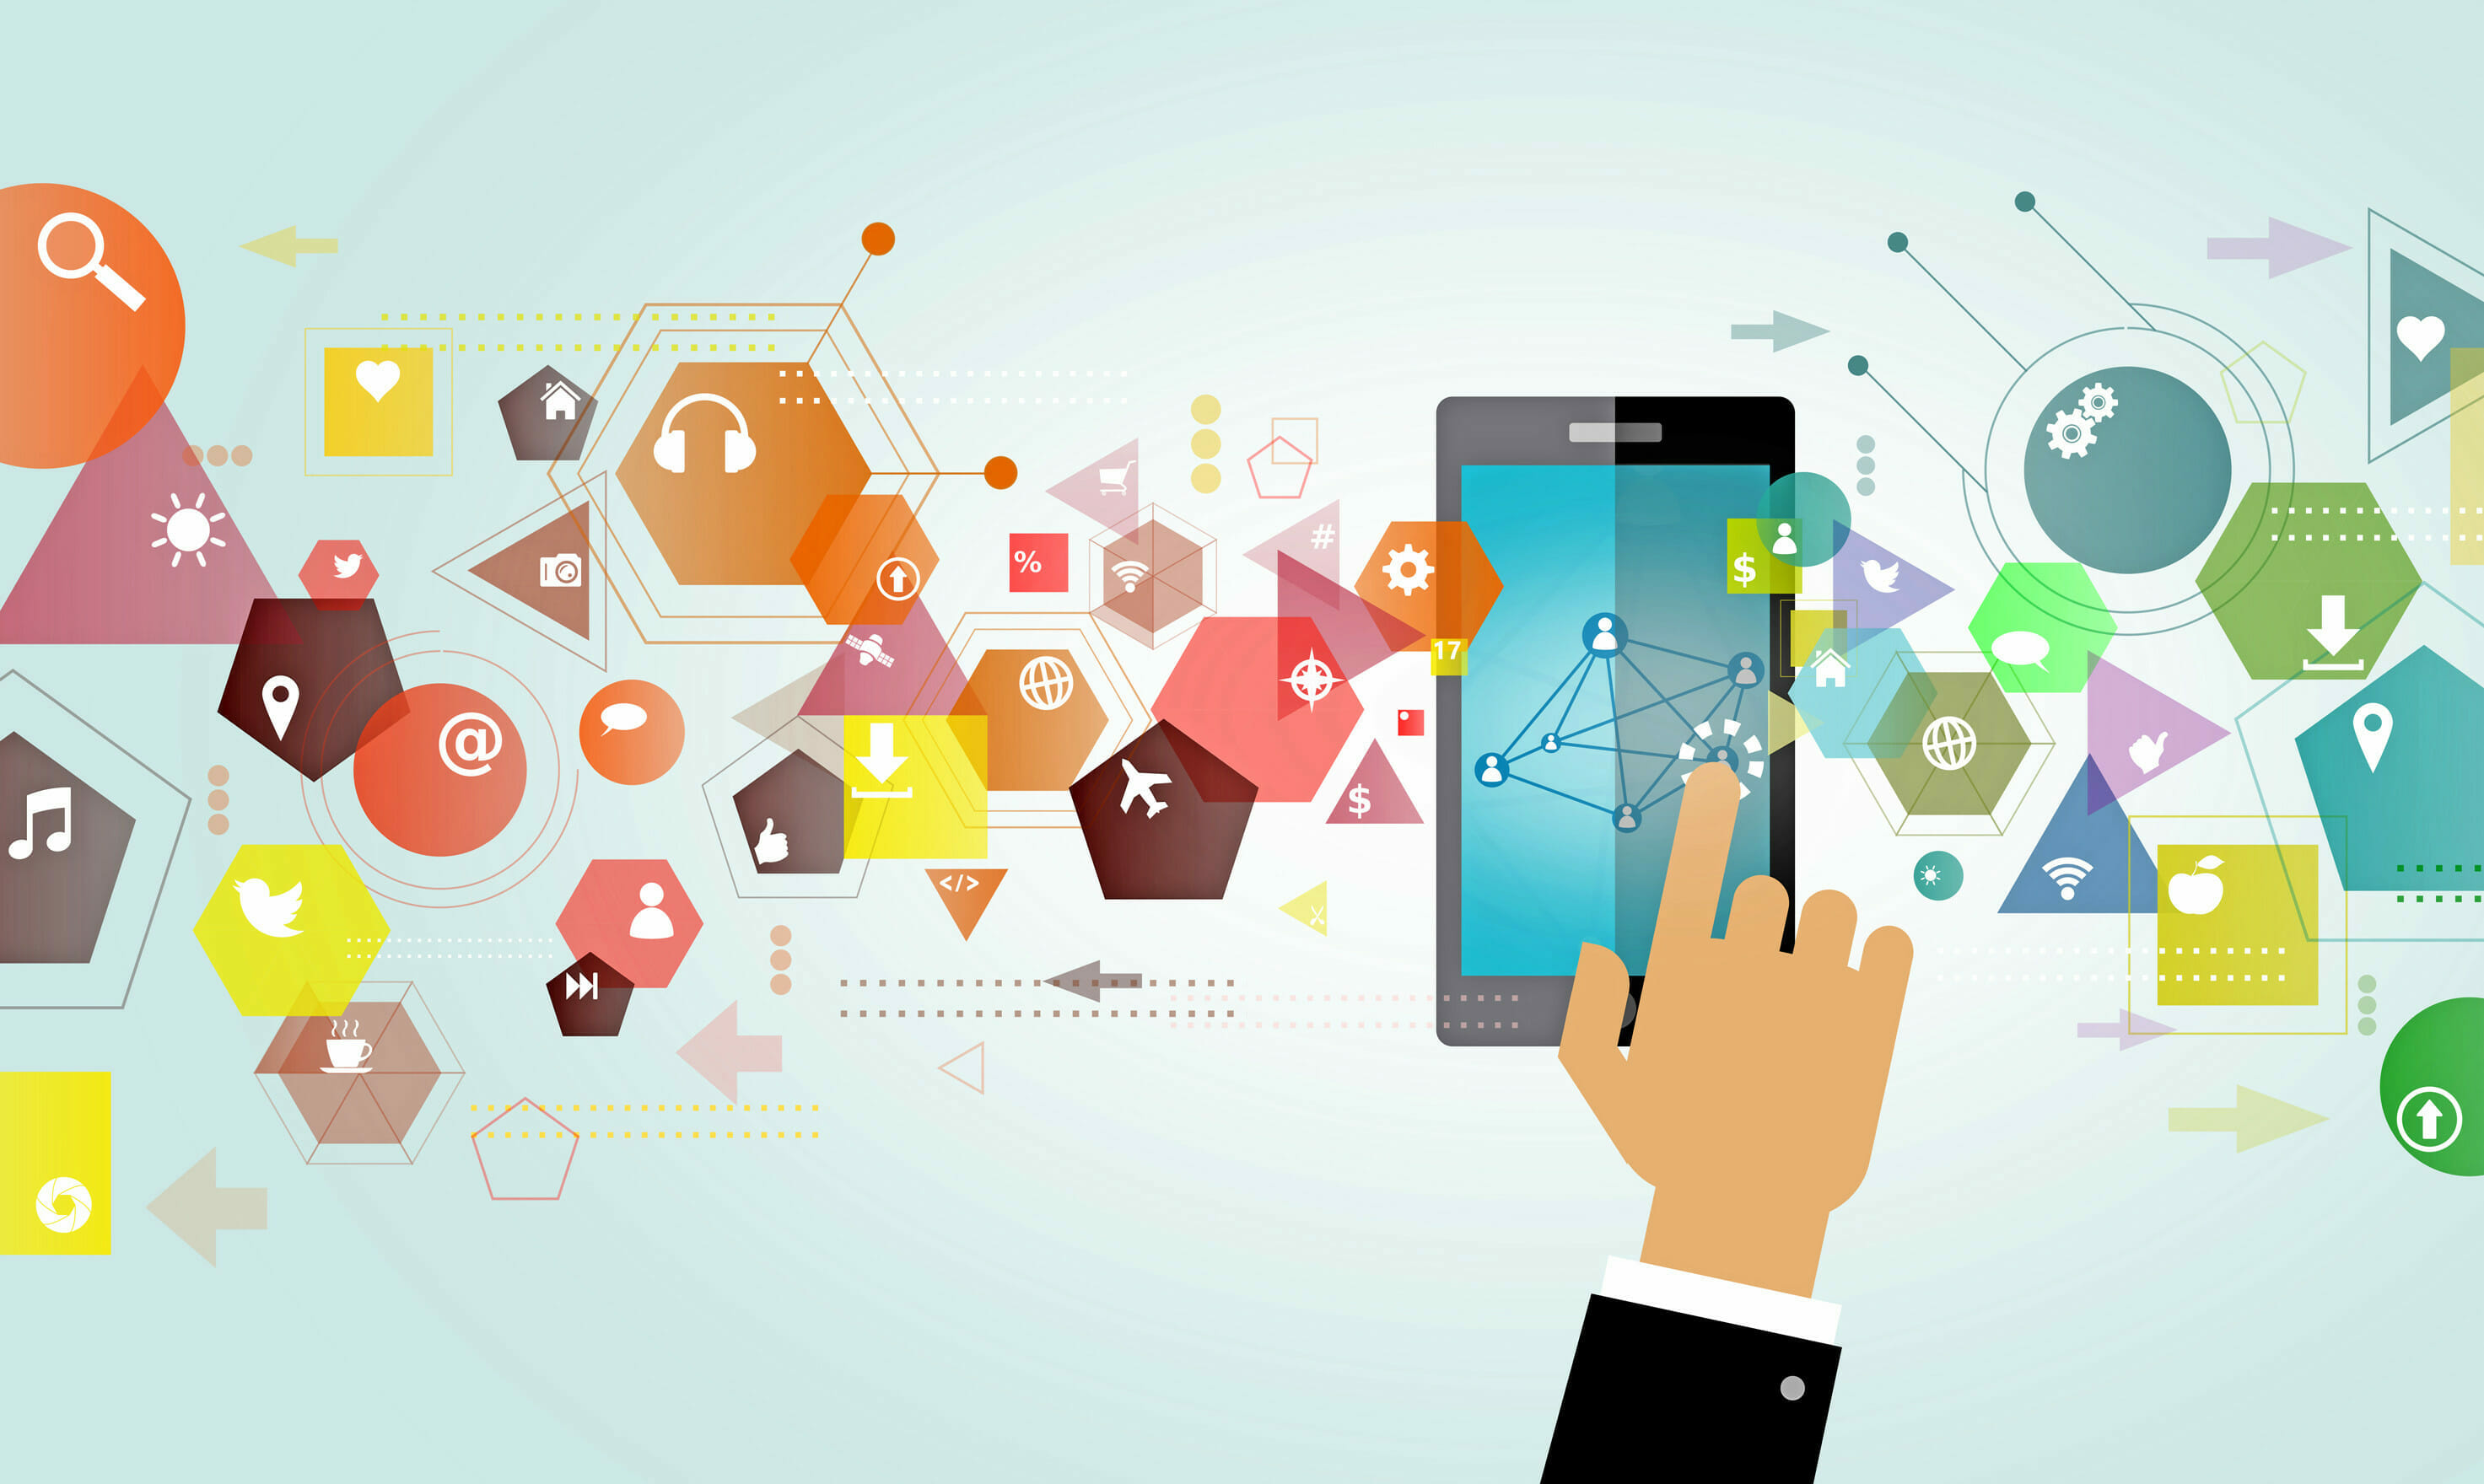 Smartphone in the cloud